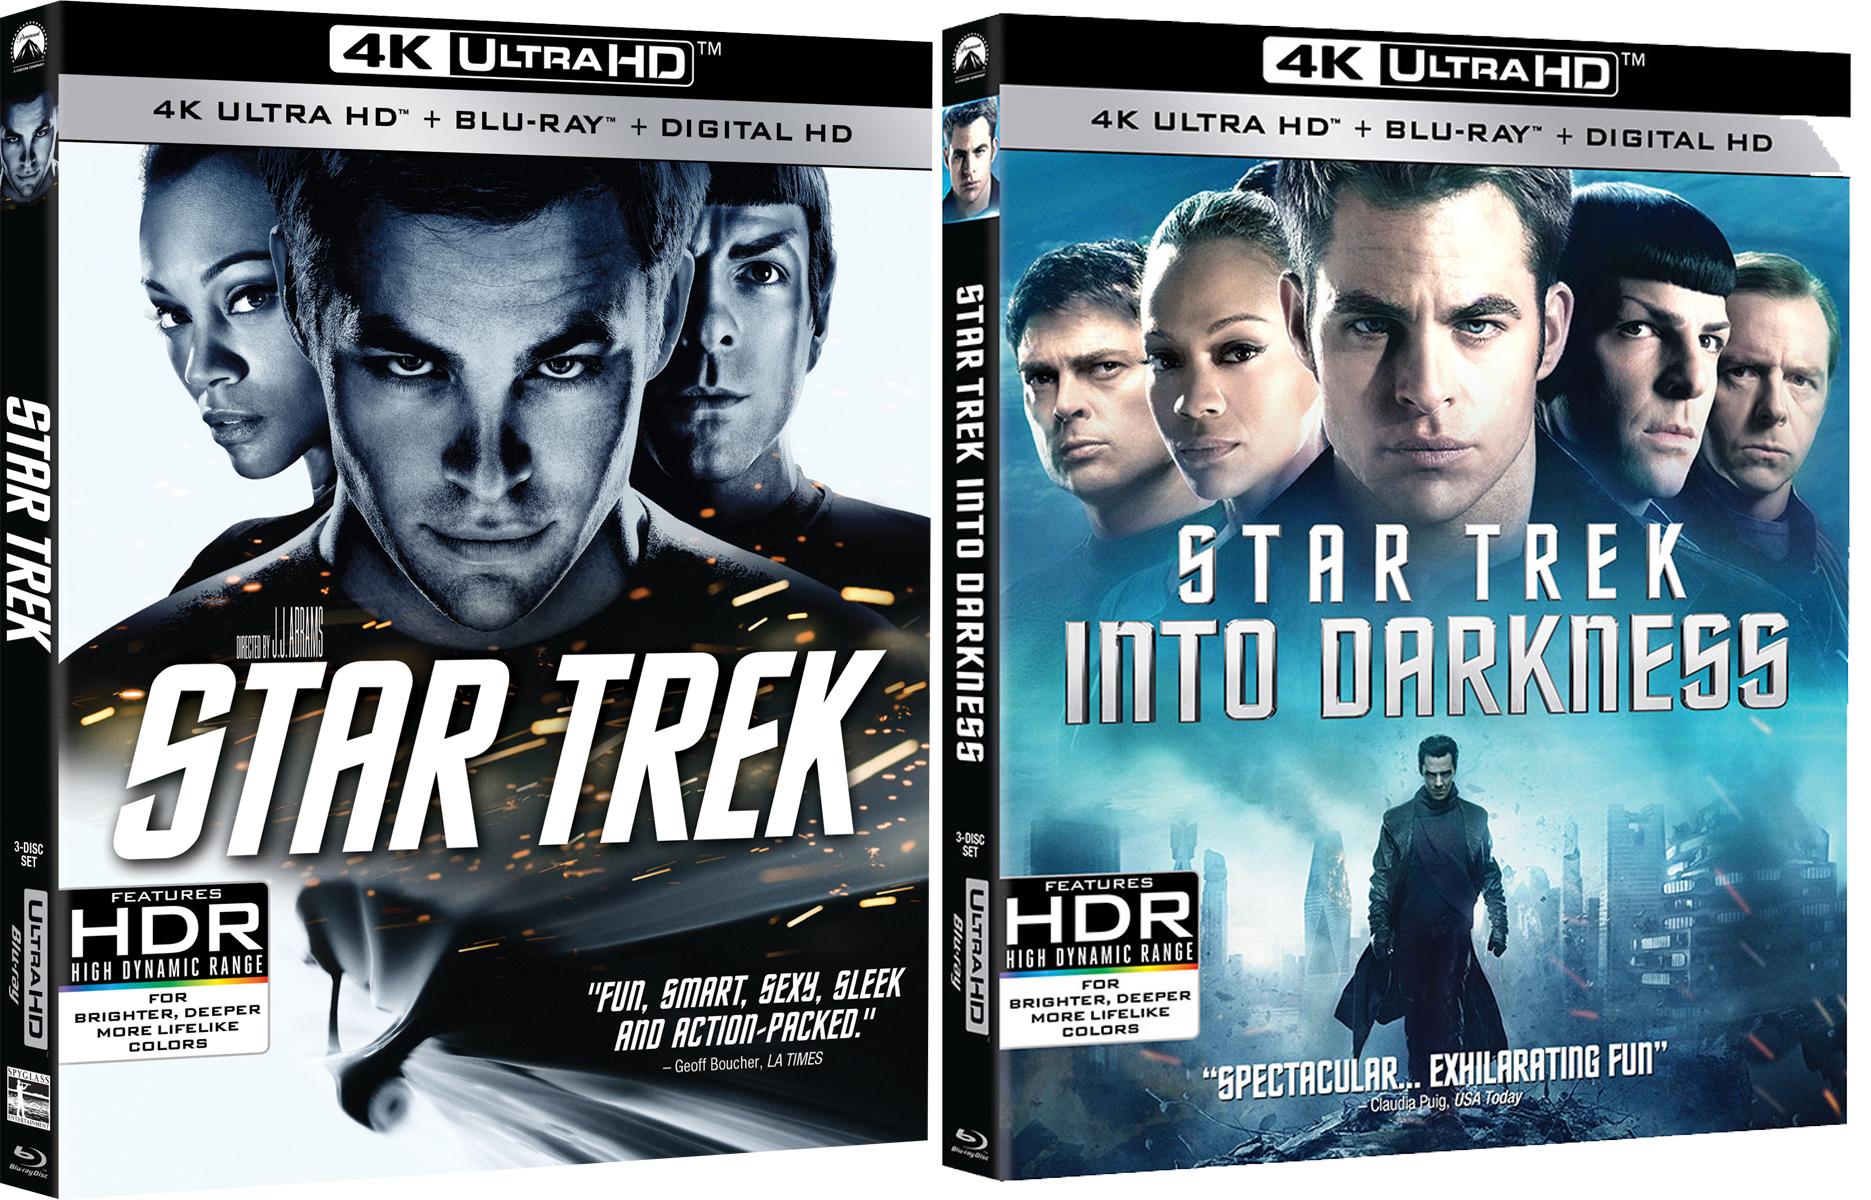 Star Trek Blu-ray 4K